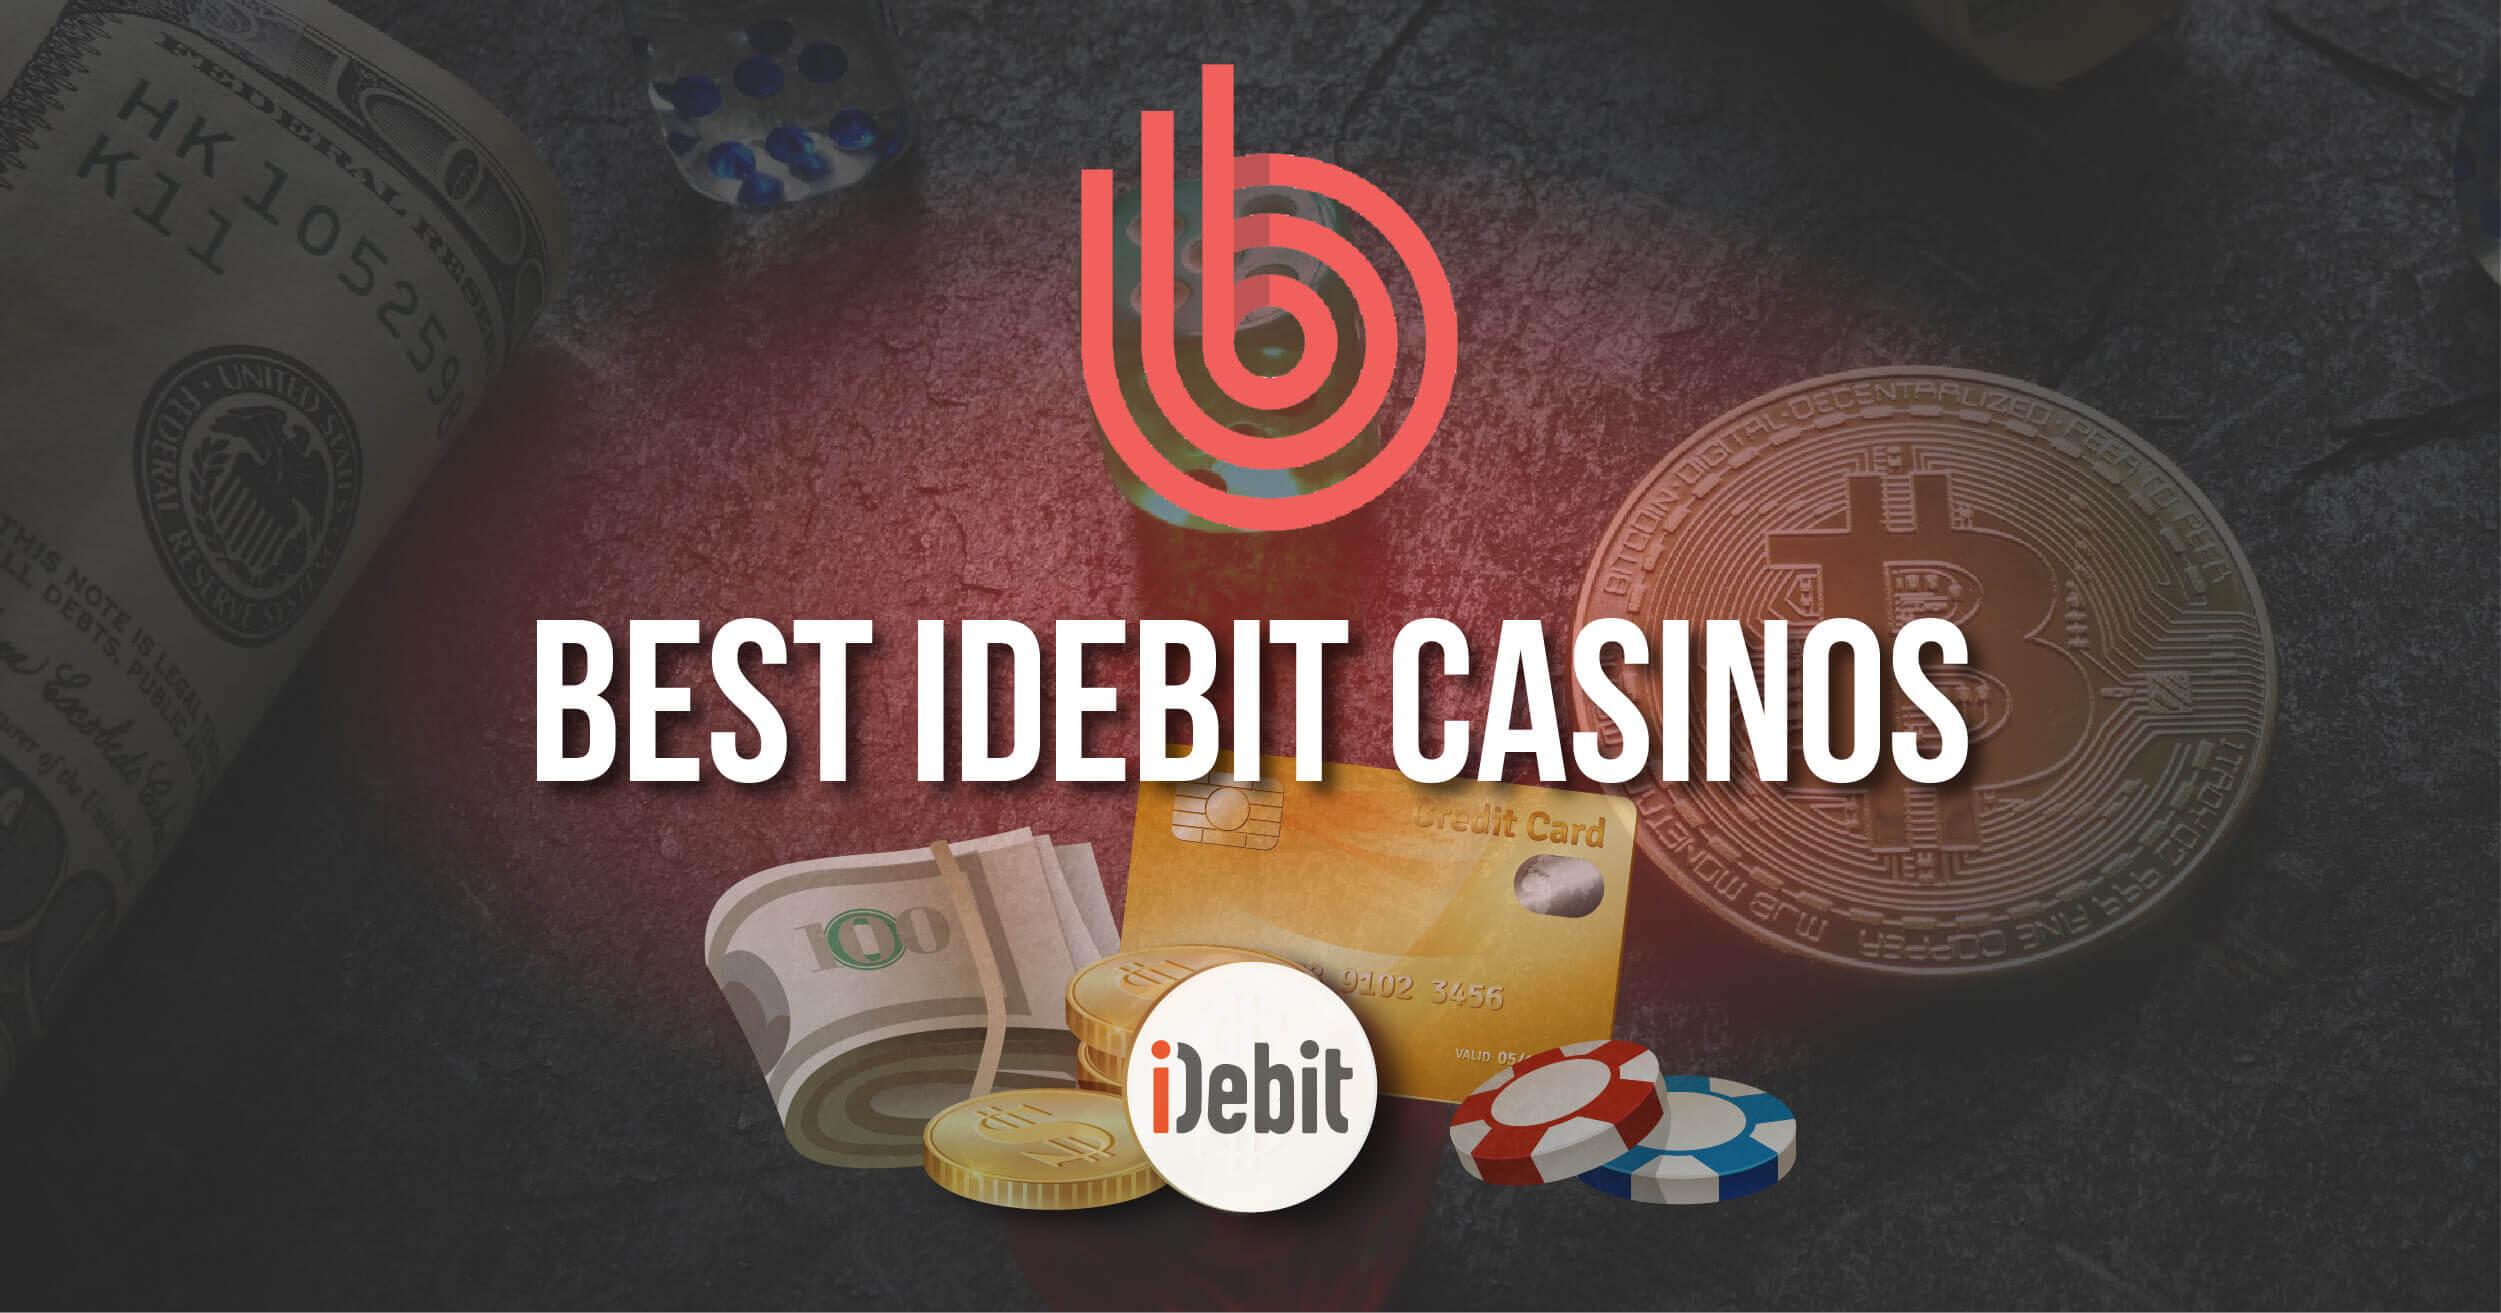 Best Idebit Casinos